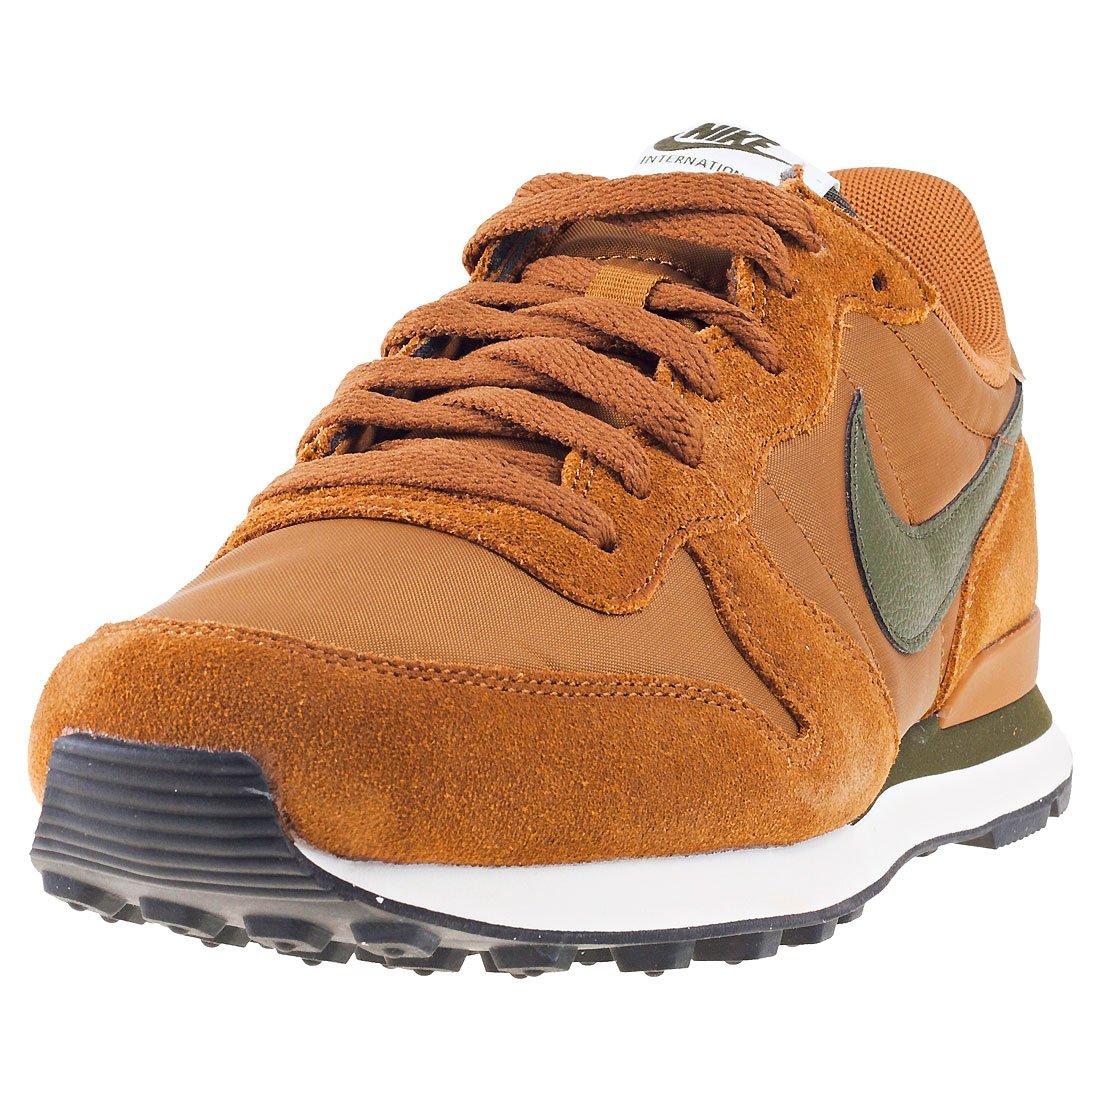 classic fit 832e7 cc6cd Nike Internationalist Mens Trainers Brown Khaki - 11.5 UK  Amazon.co.uk   Shoes   Bags